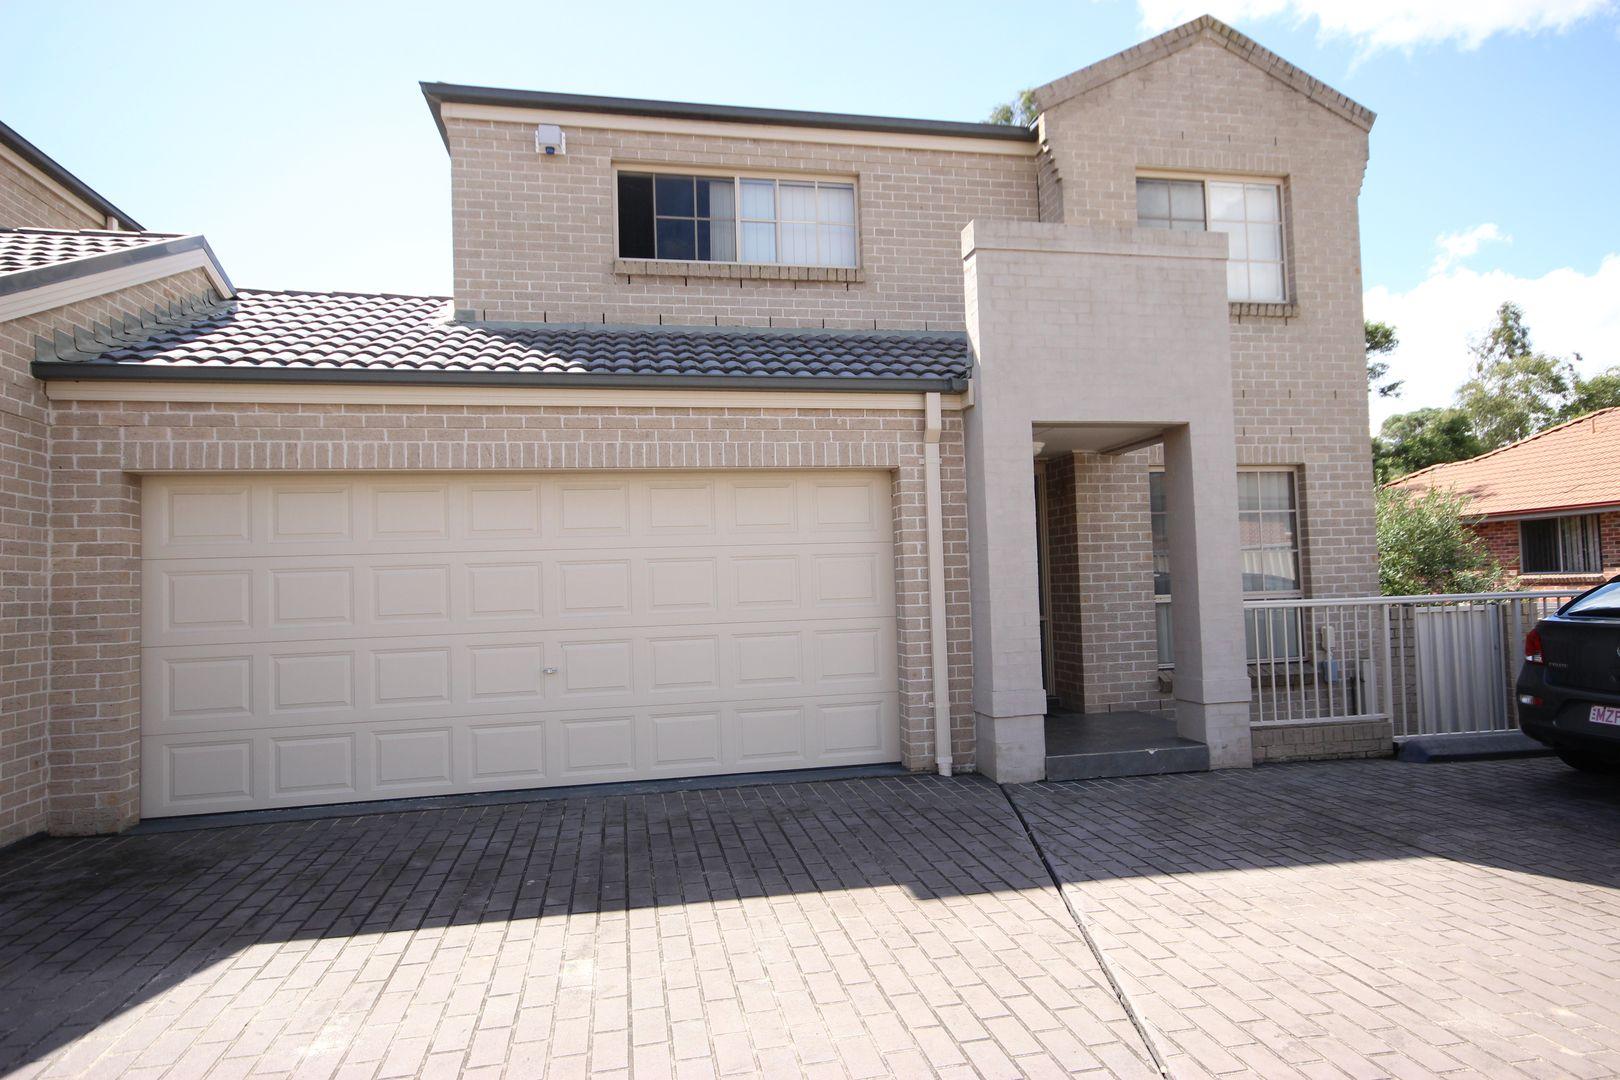 10/5 Gilmore Road, Casula NSW 2170, Image 0